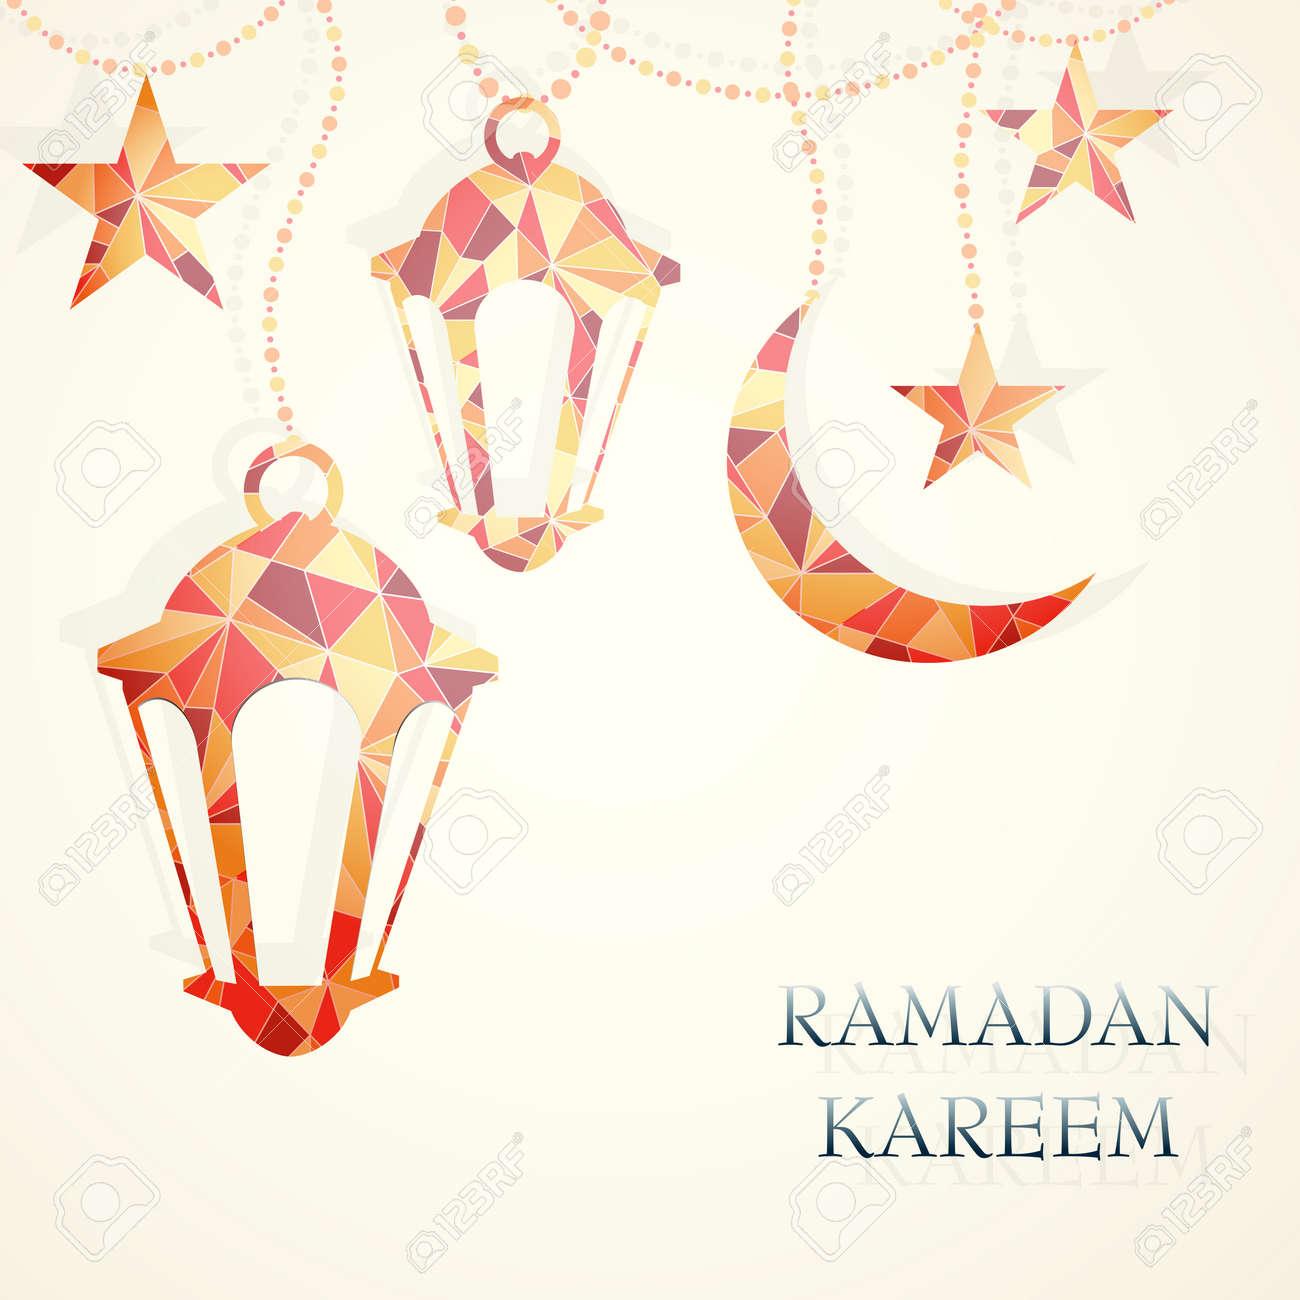 Ramadan greeting card design. - 29855171